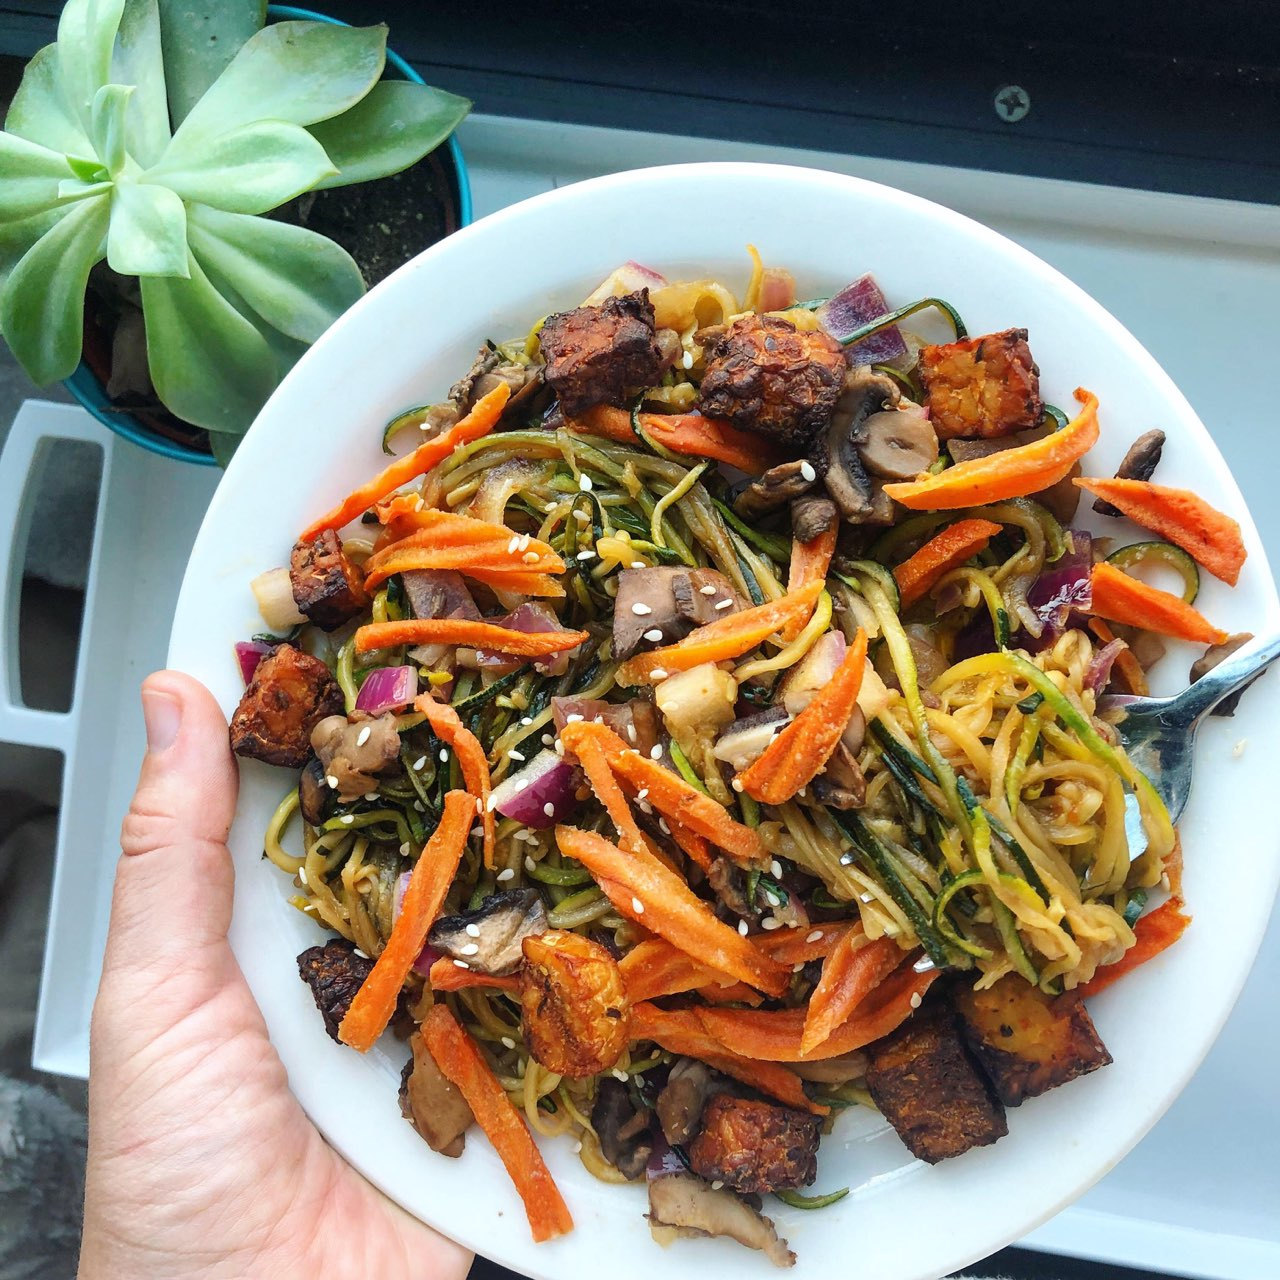 Grain-Free Sesame Street Noodles - Vegan, Gluten-Free, Paleo